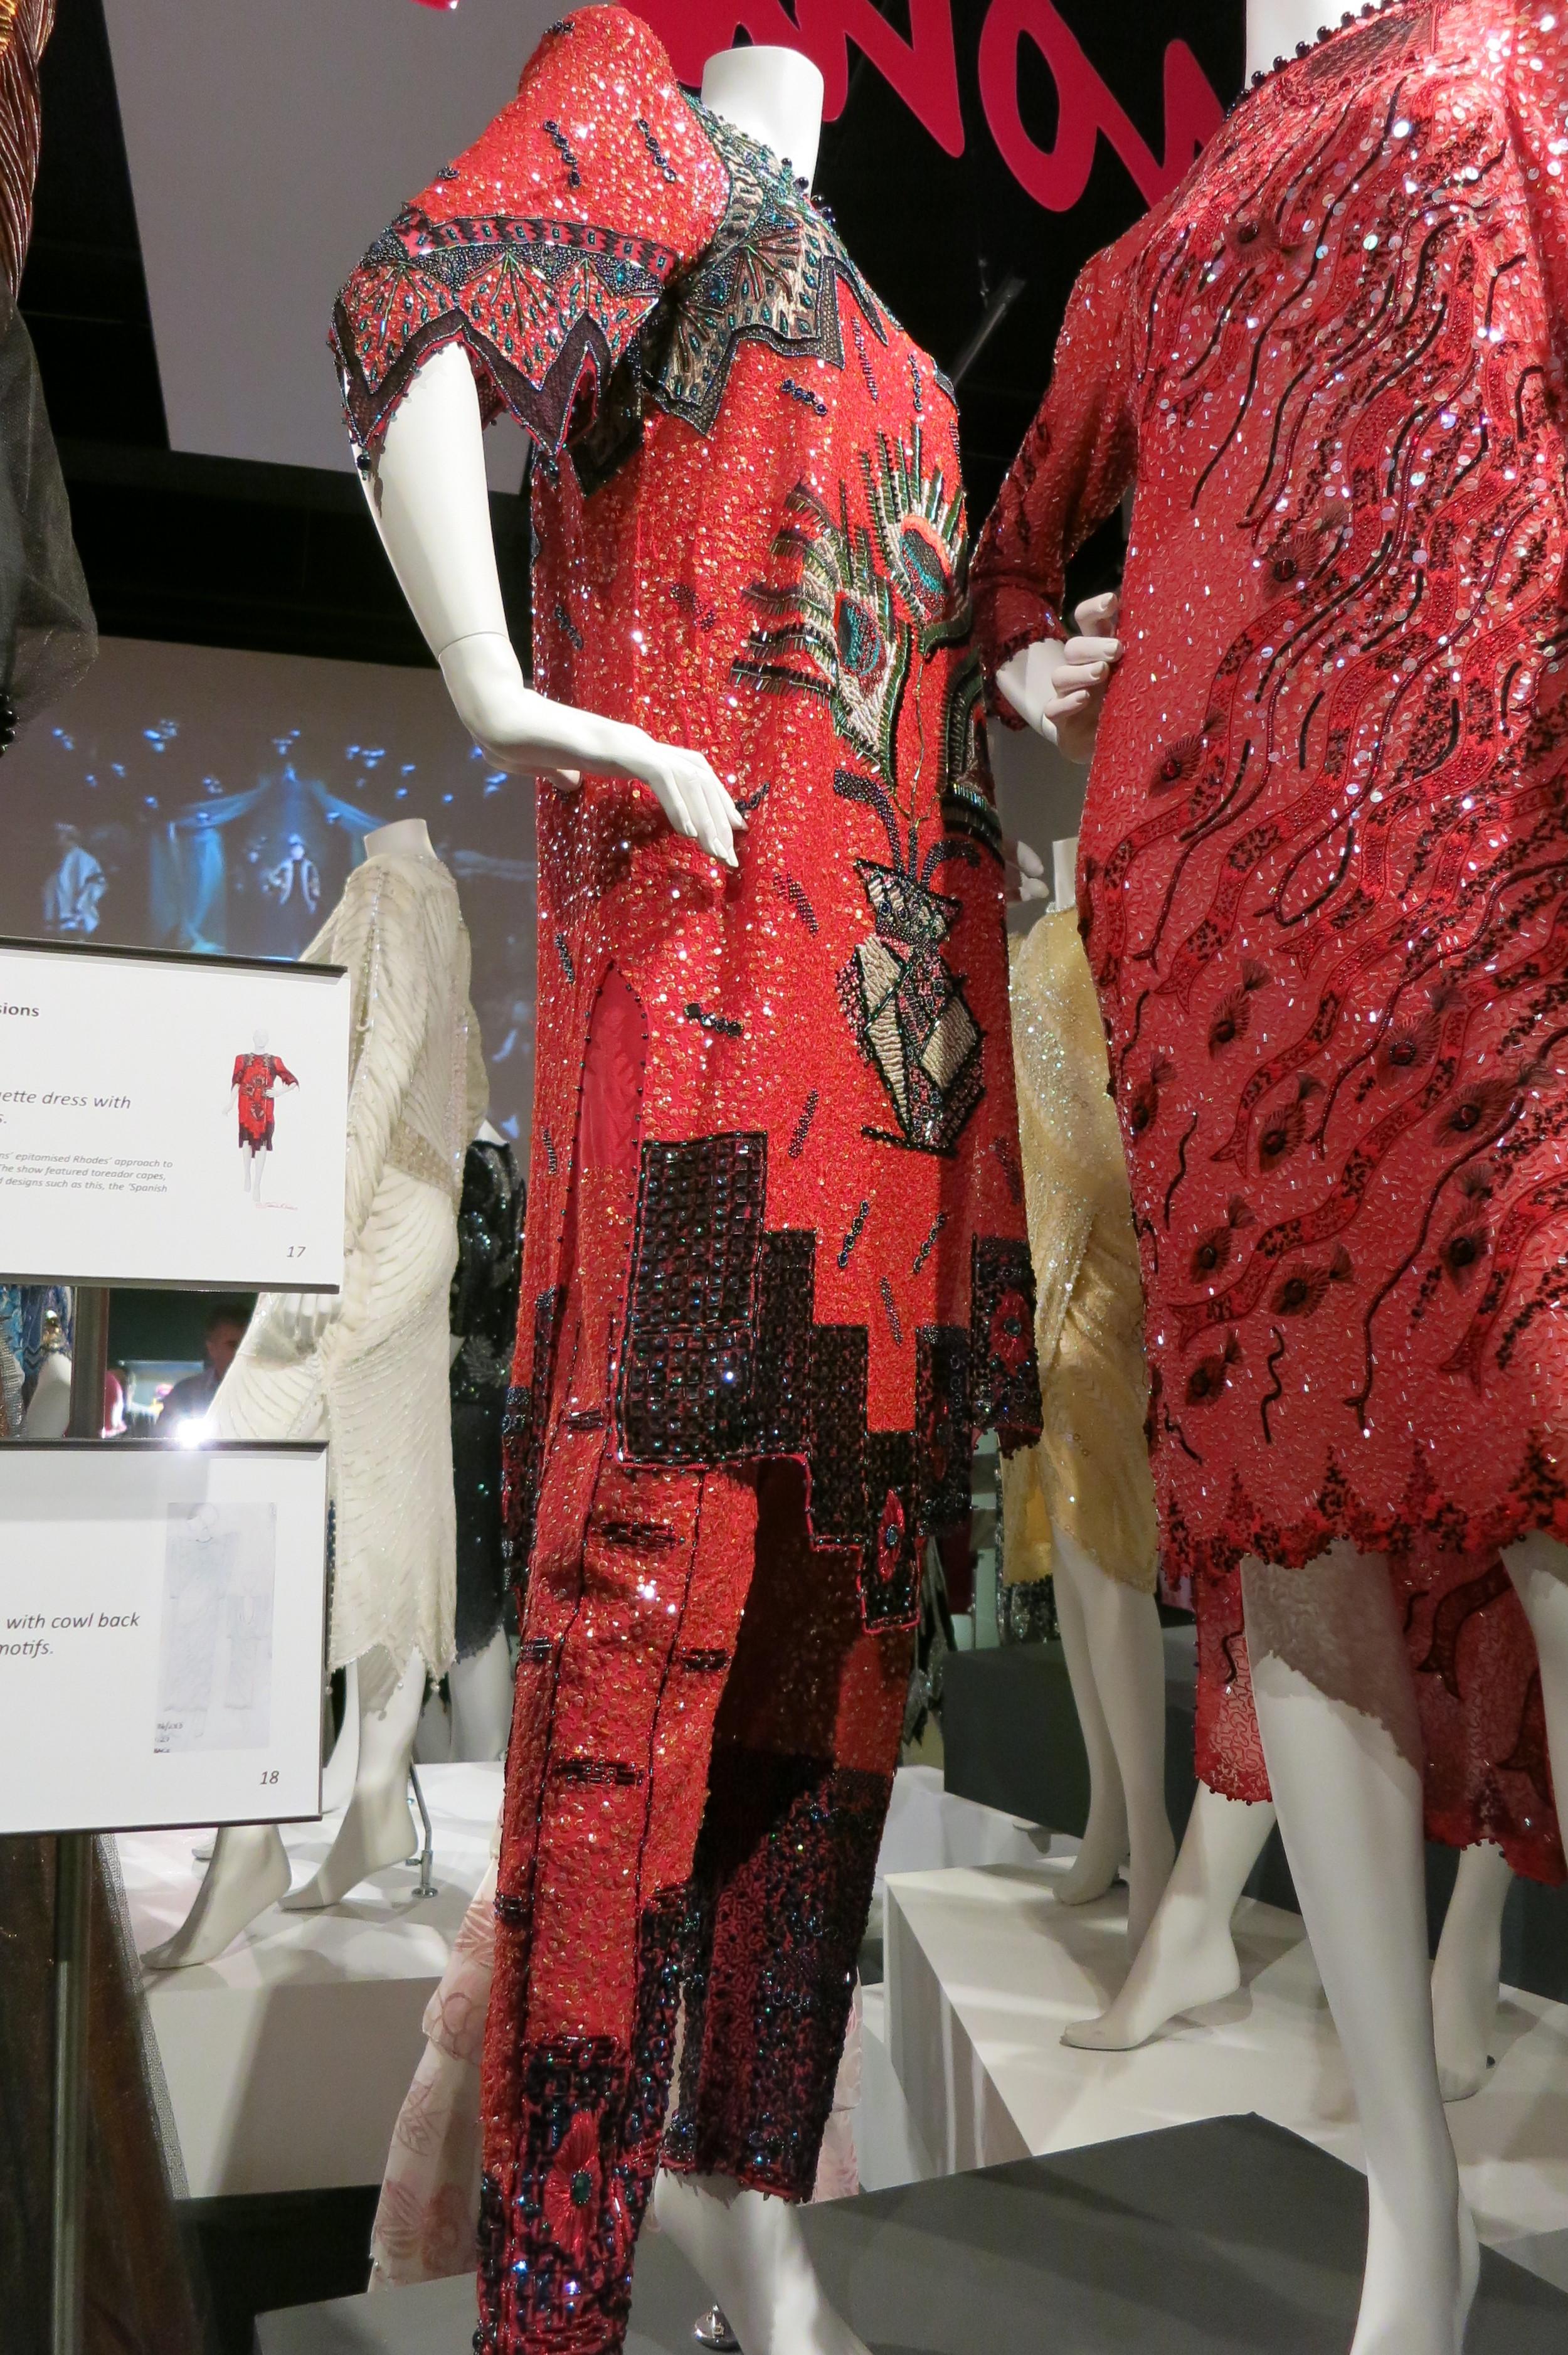 Zandra Rhodes exhibitio at the Fashion & Textile Museum, Bermondsey, London 2013 - Hand beaded dresses designed by Zandra Rhodes in the 1980s